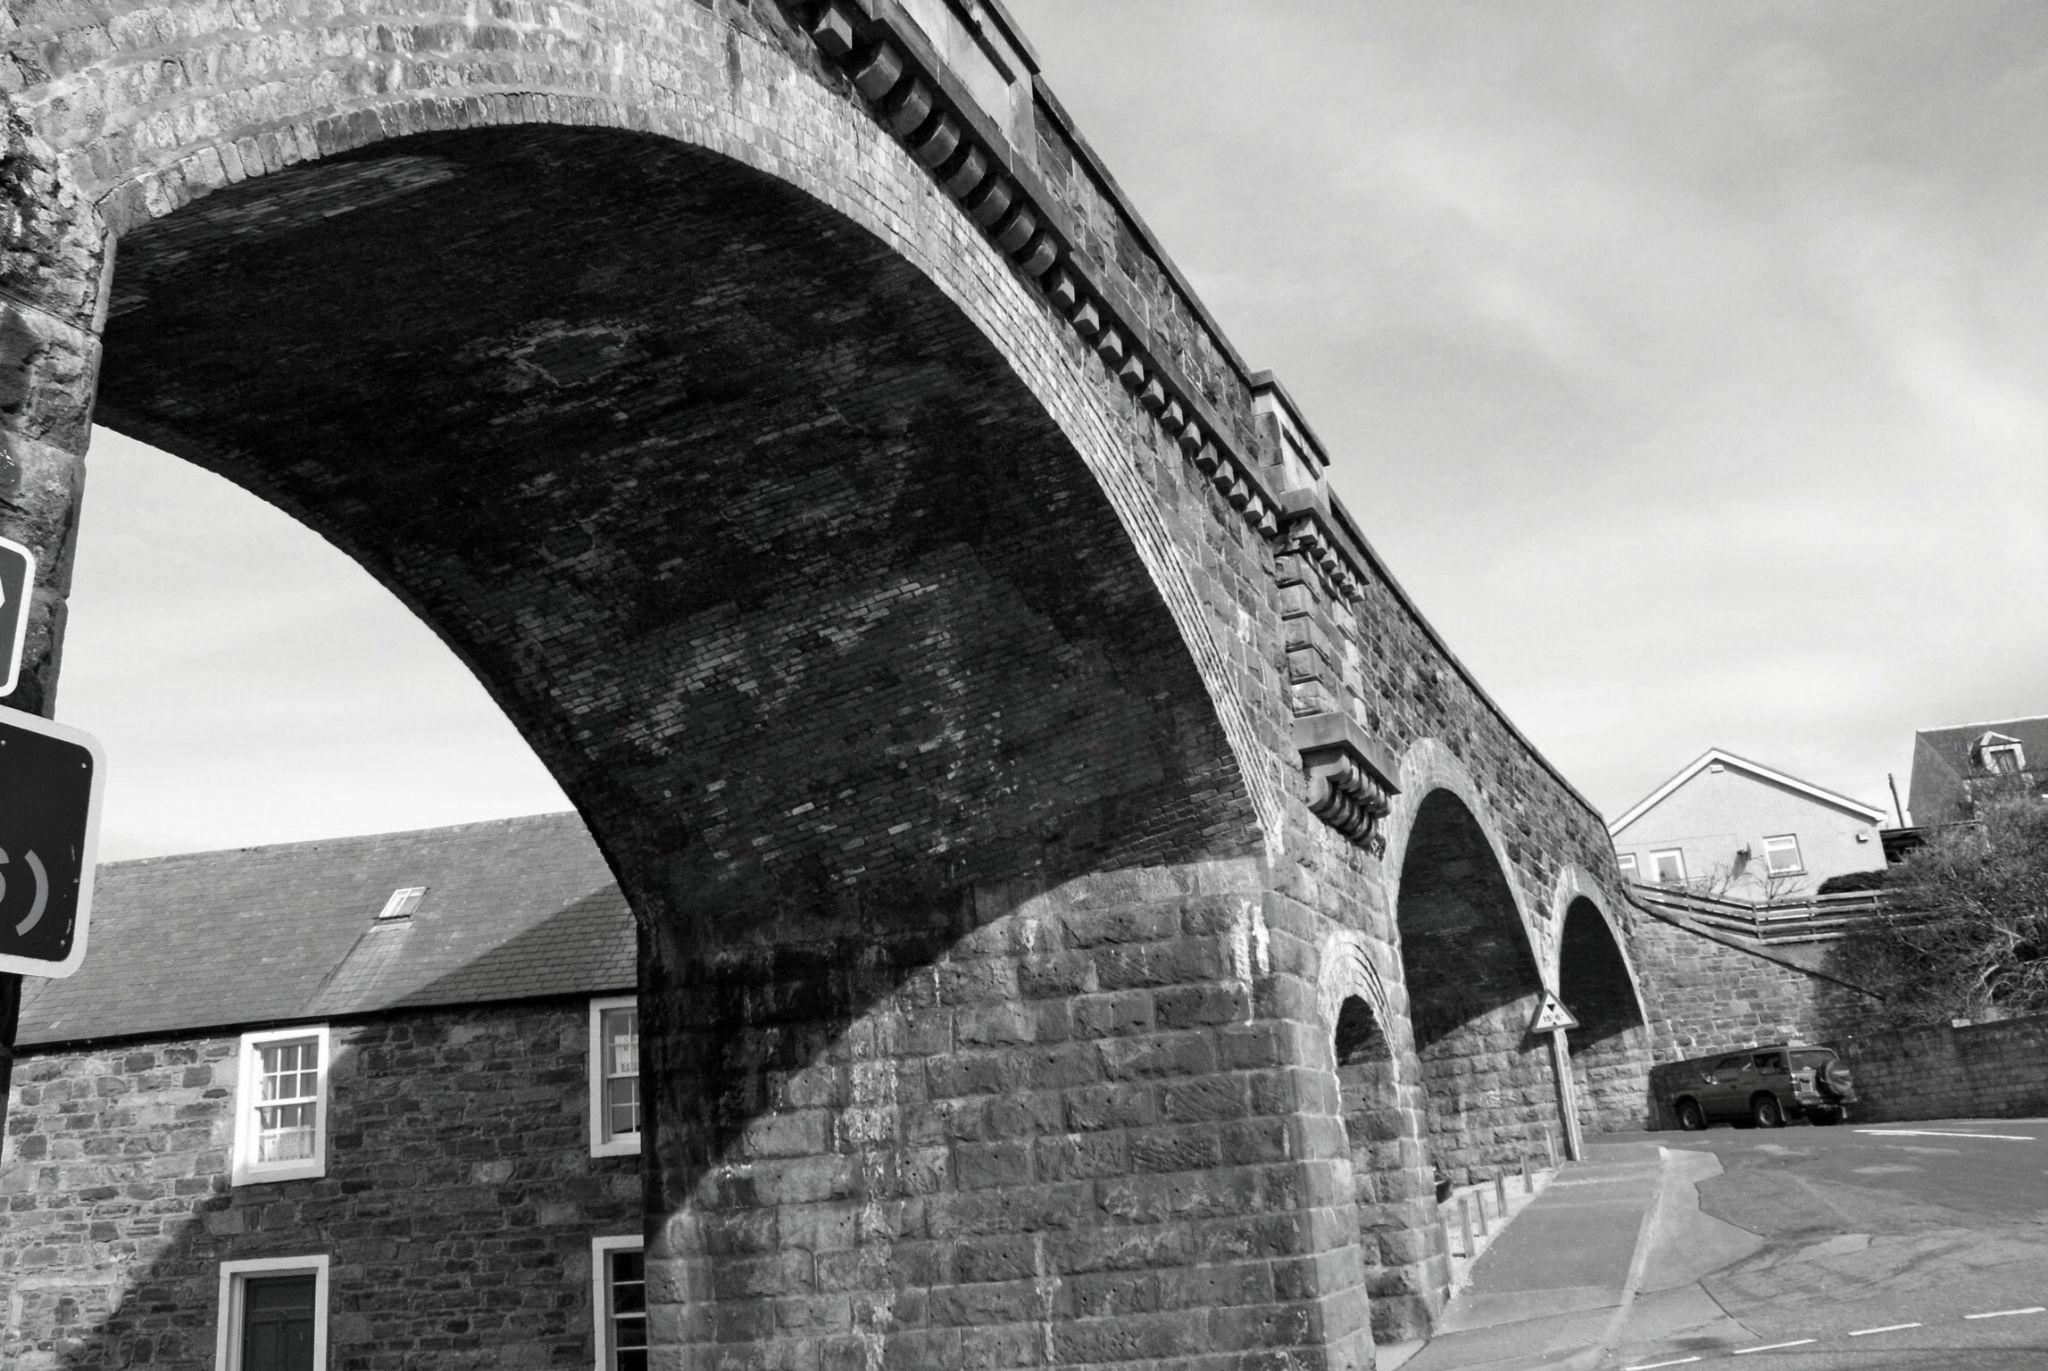 Viaduct by tash.scott73